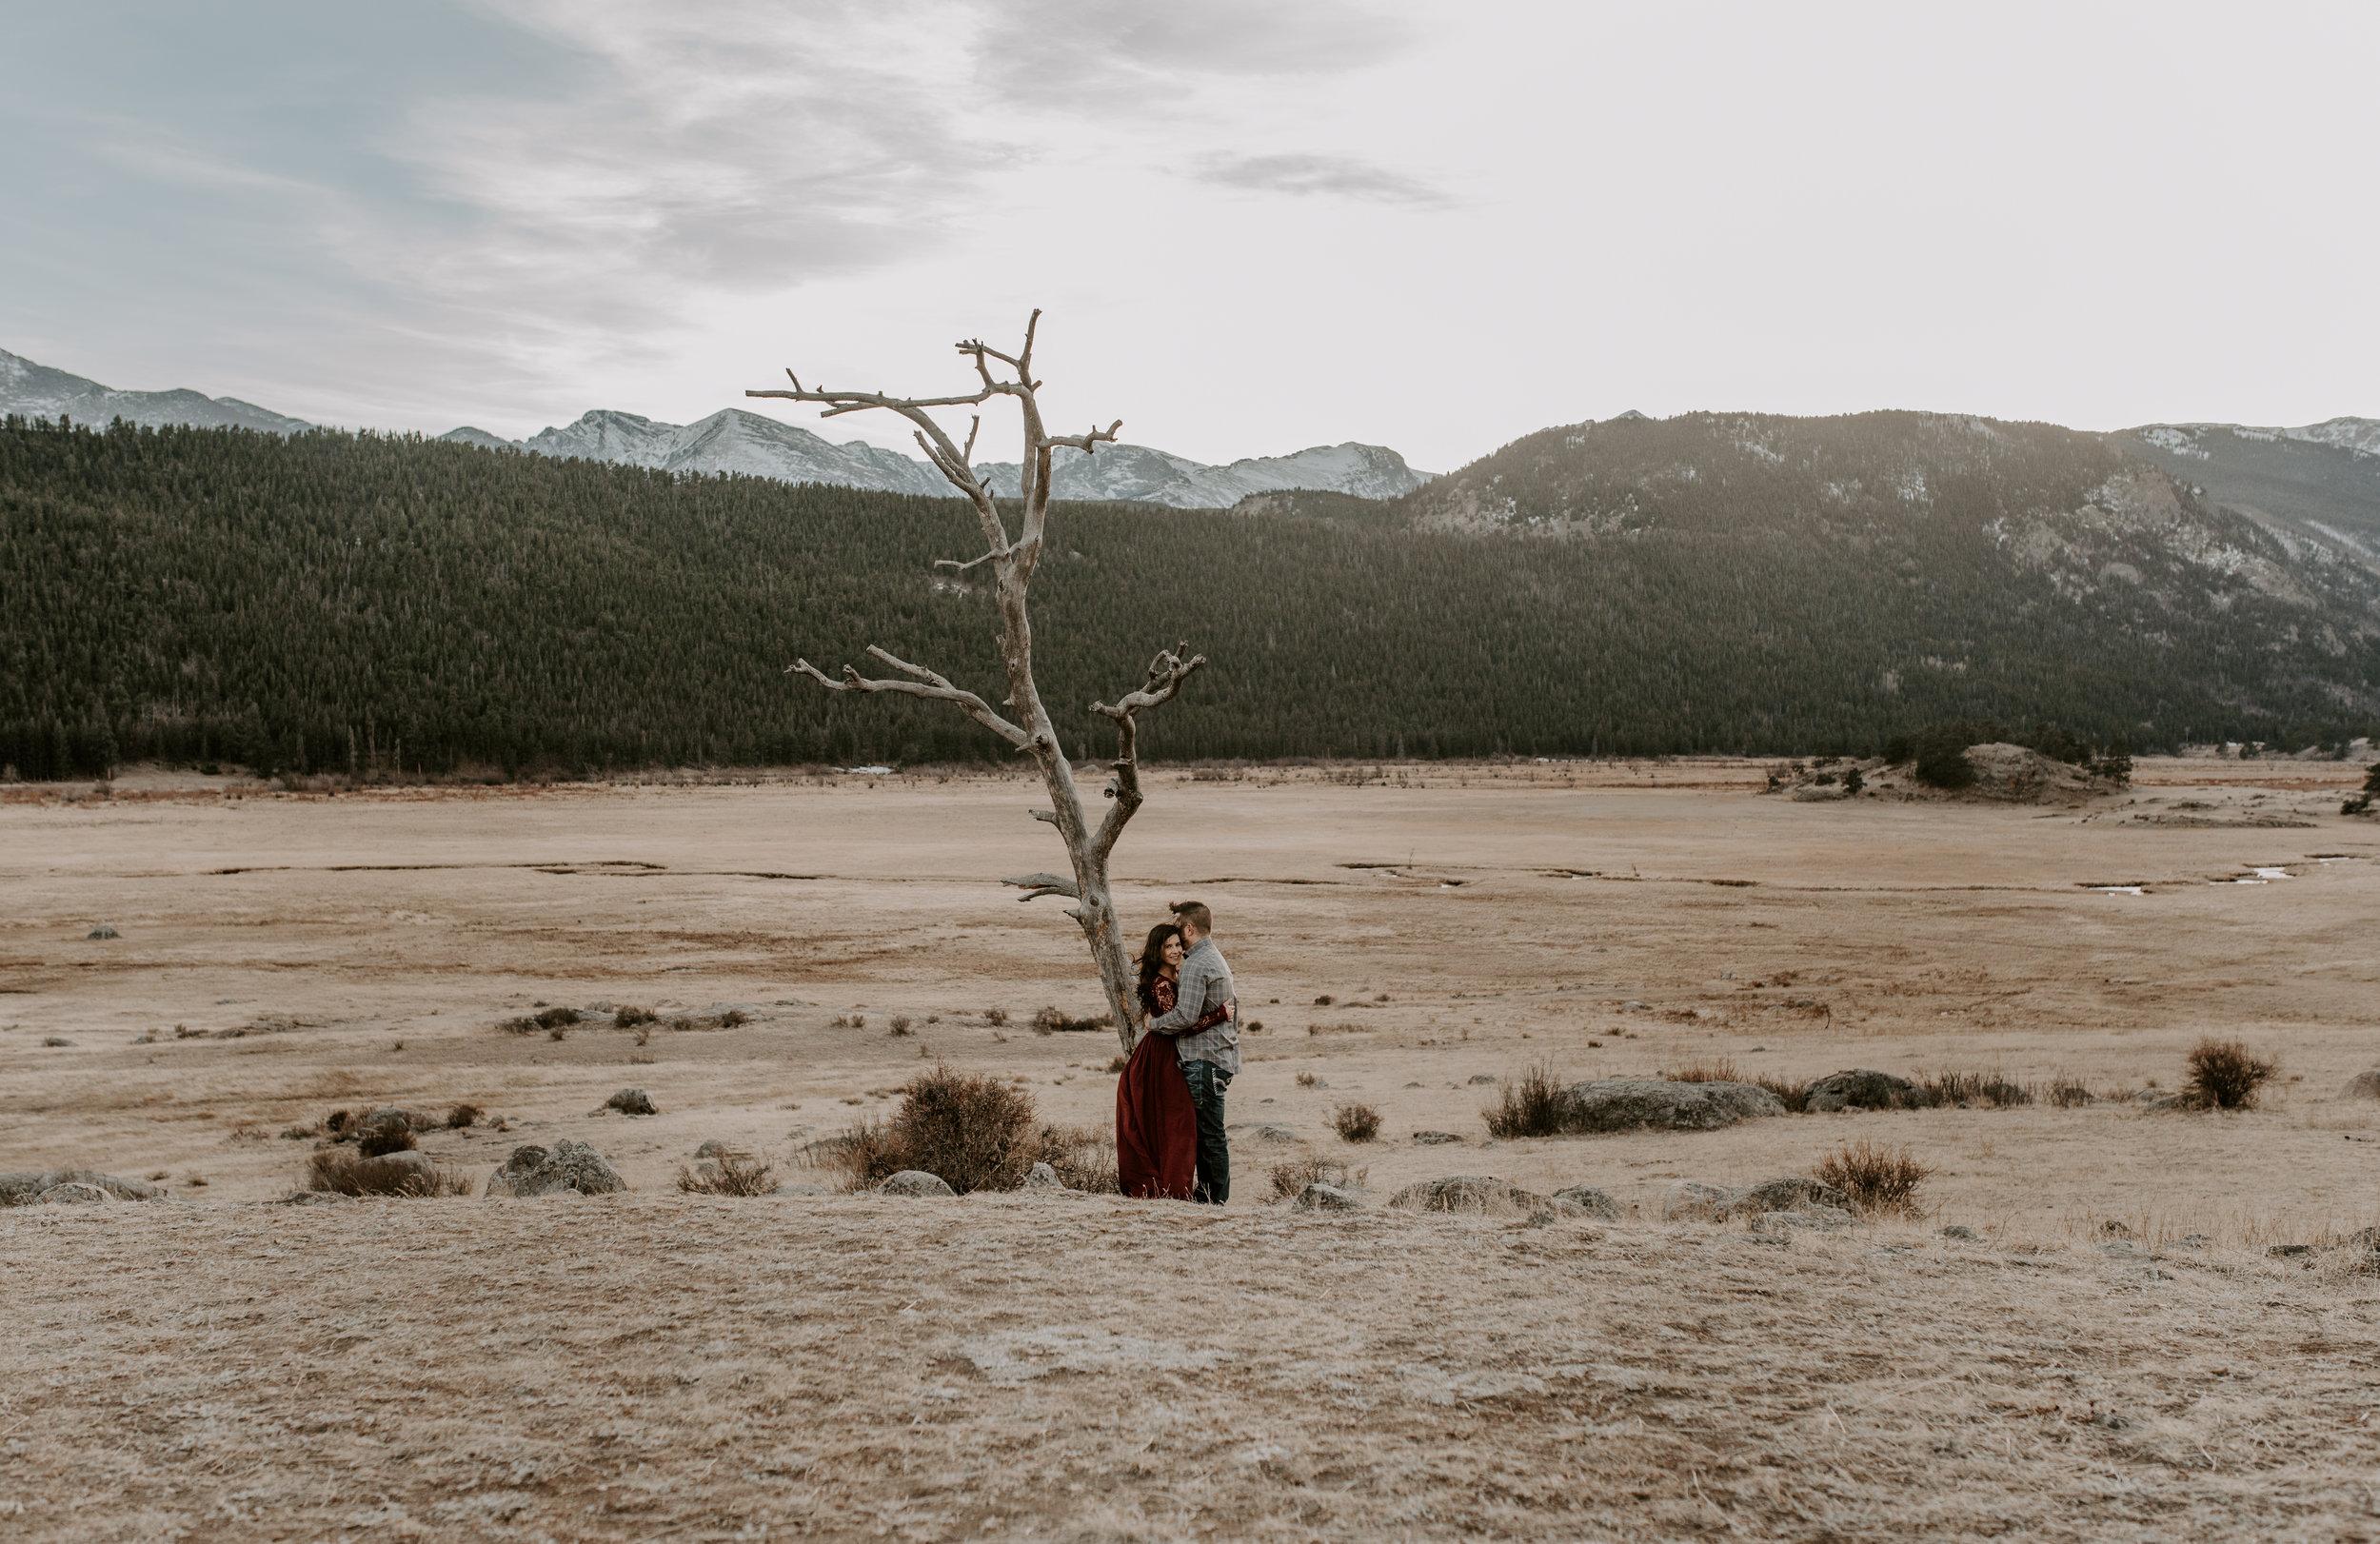 Denver, Colorado based elopement photographer and intimate wedding photographer.